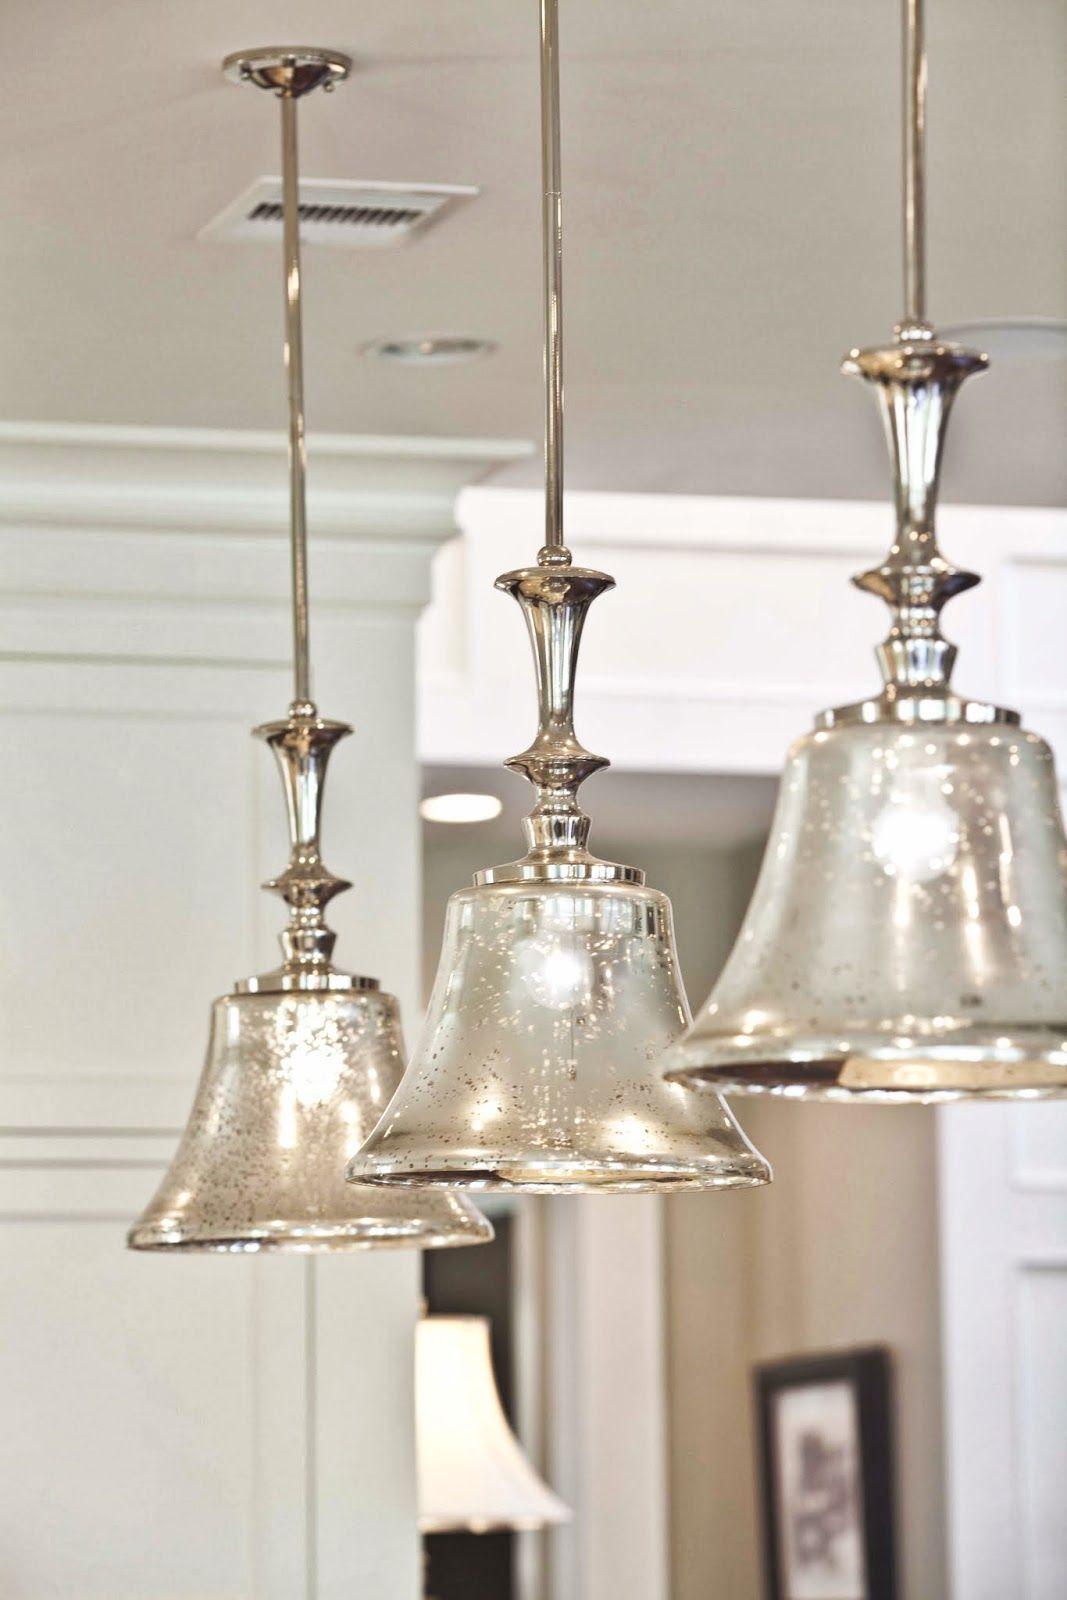 Kitchen: Mercury Glass Light Pendant Neiman Marcus Pendant Lights Kitchen  Island Pendant Lighting Images Kitchen Island Pendant Lighting Ideas,